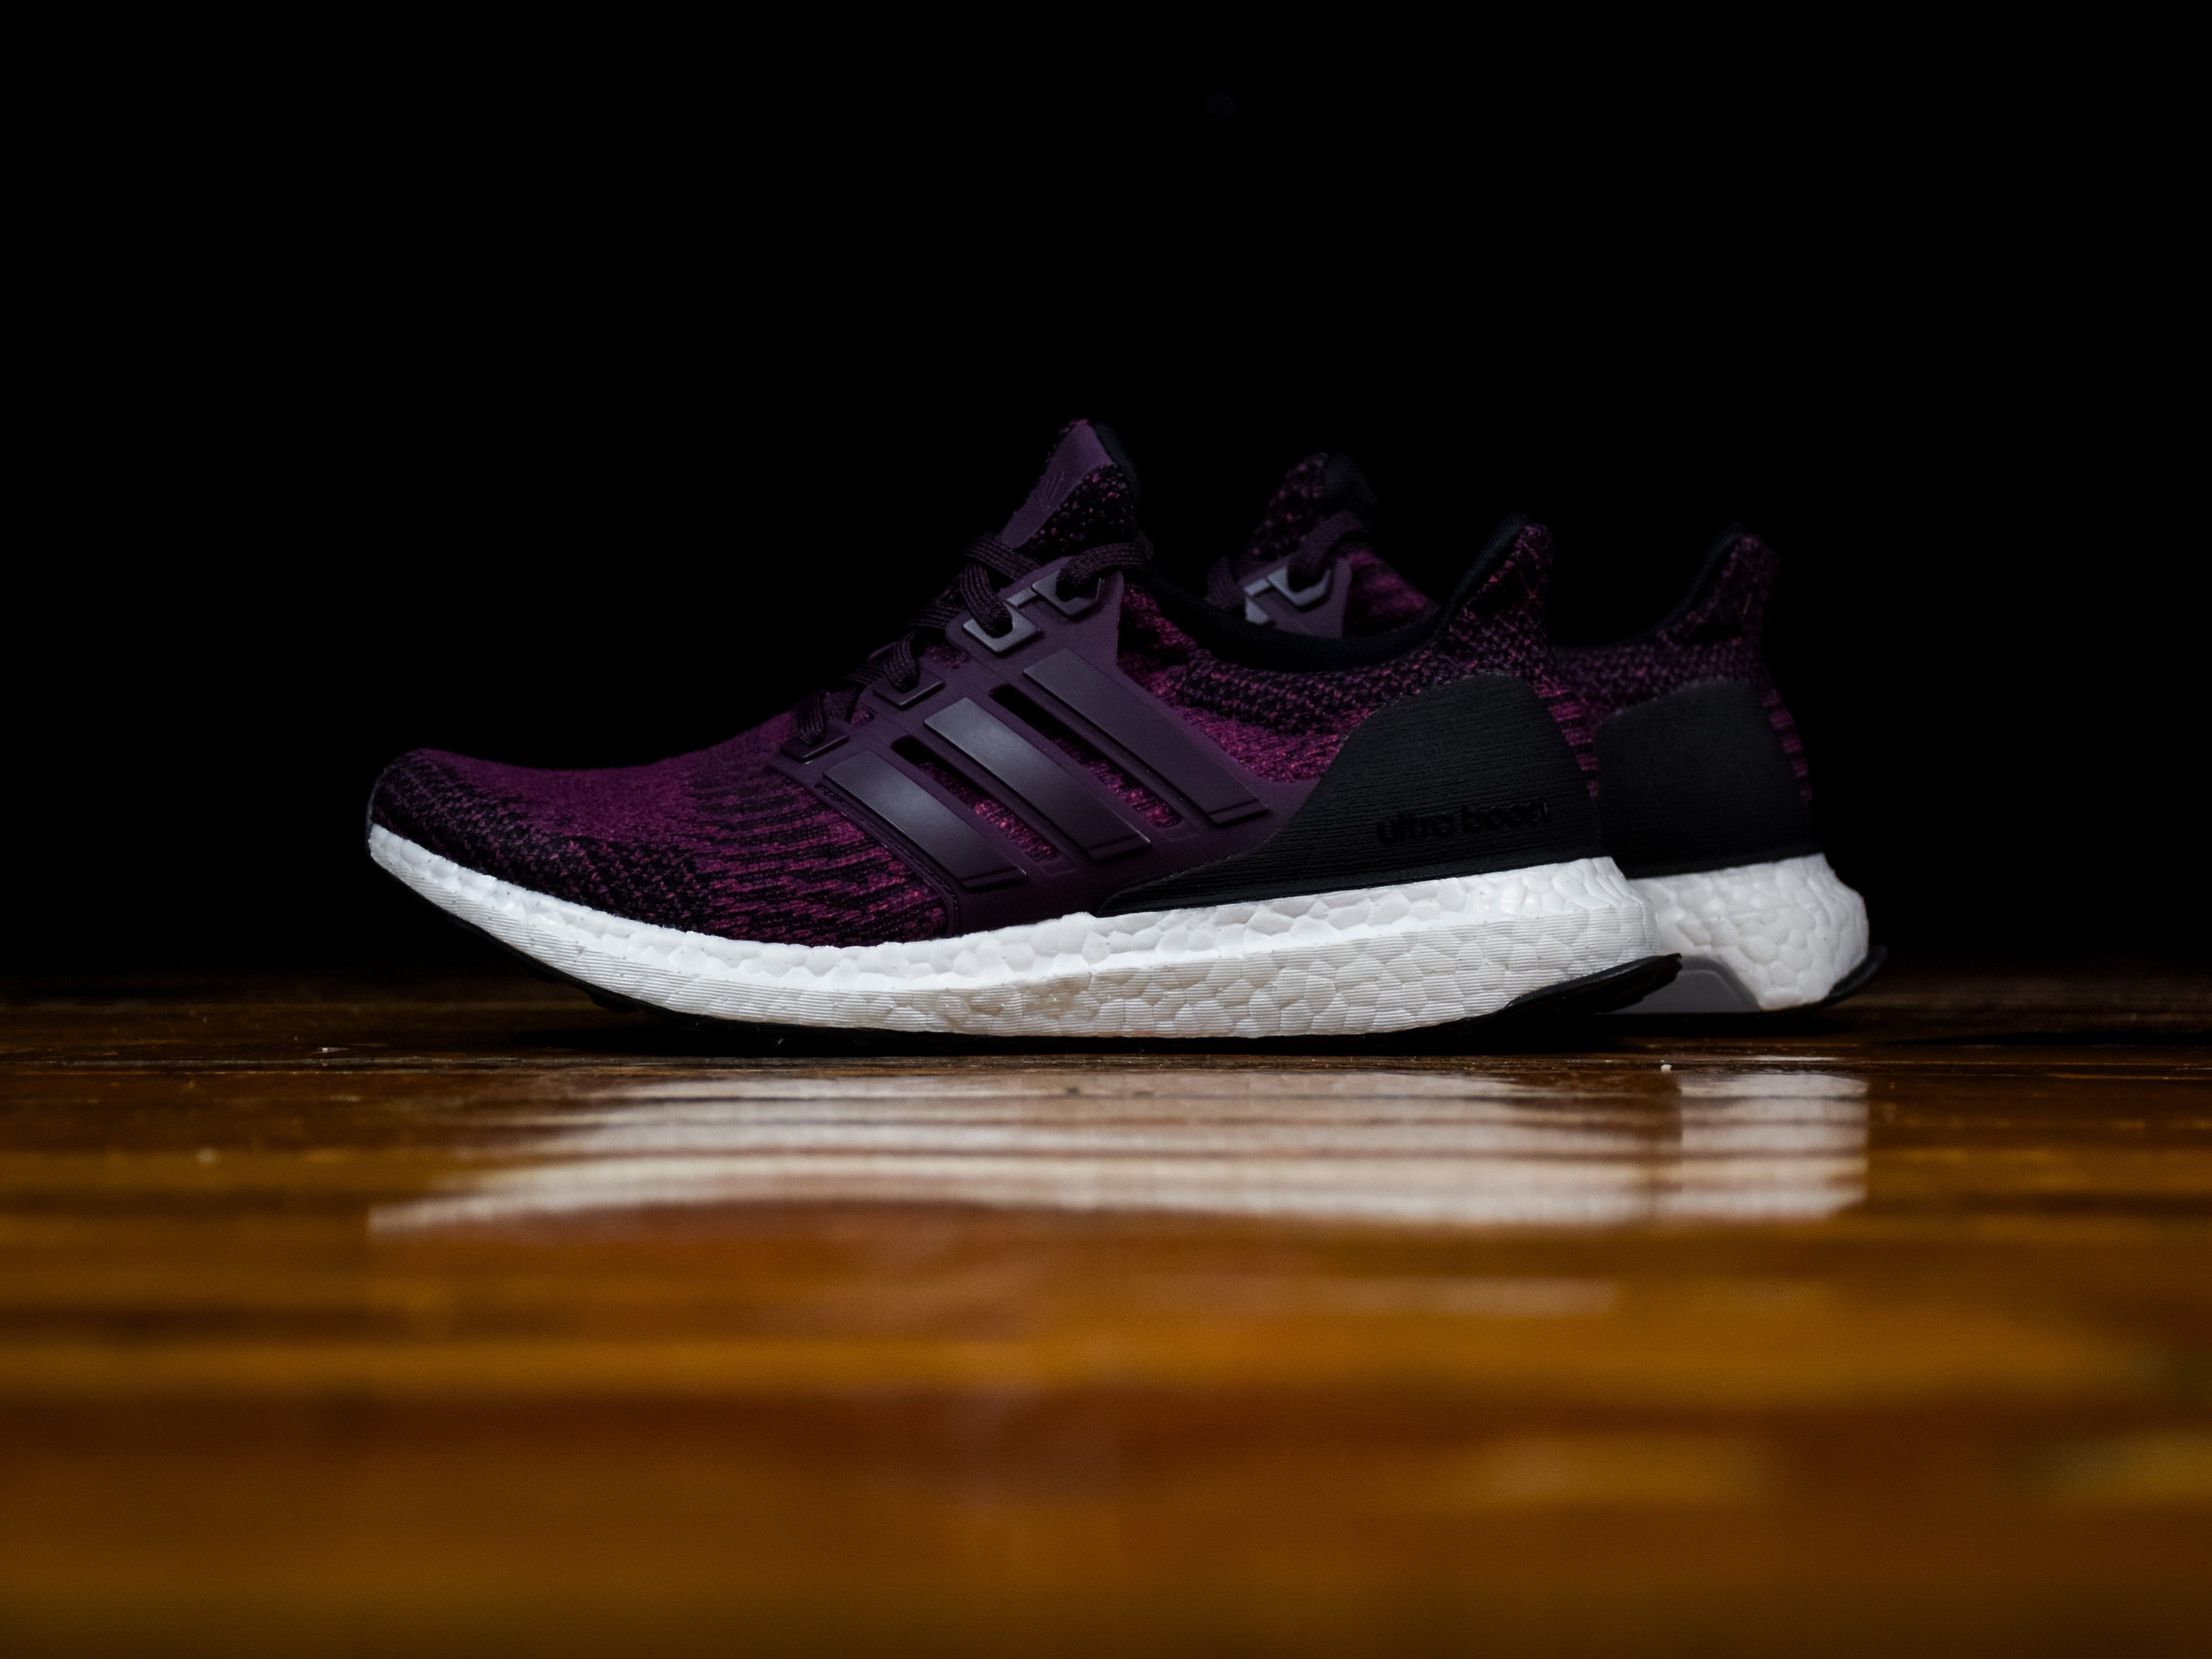 promo code 43355 57578 Women's Adidas Ultra Boost 3.0 [S82058] | Adidas Boost ...